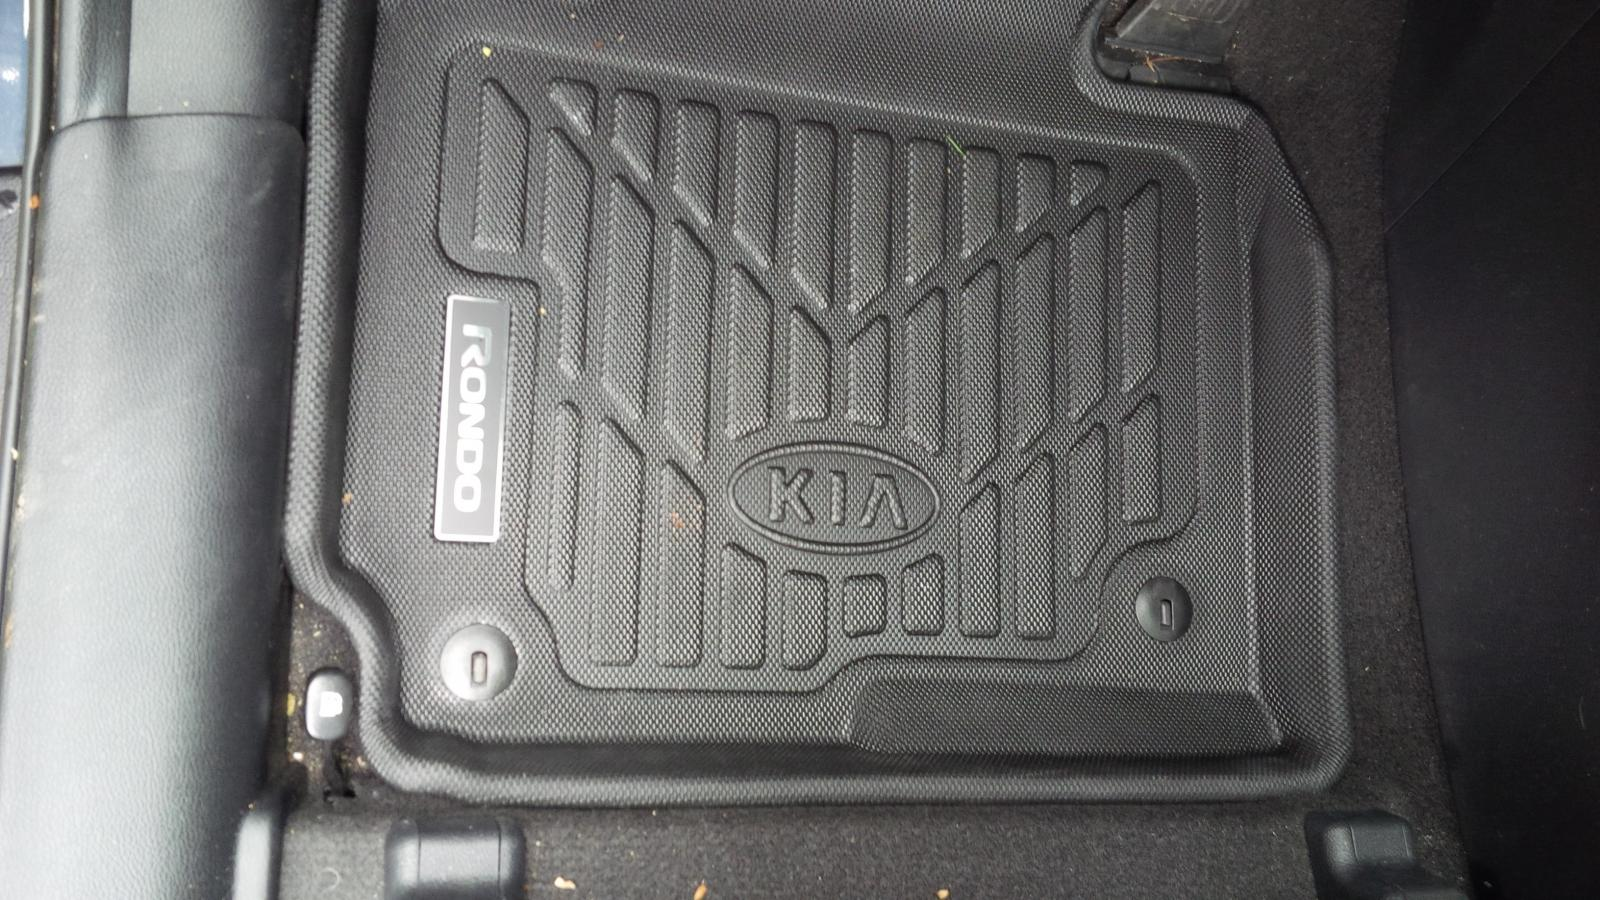 Weathertech floor mats kia rondo - Attached Thumbnails